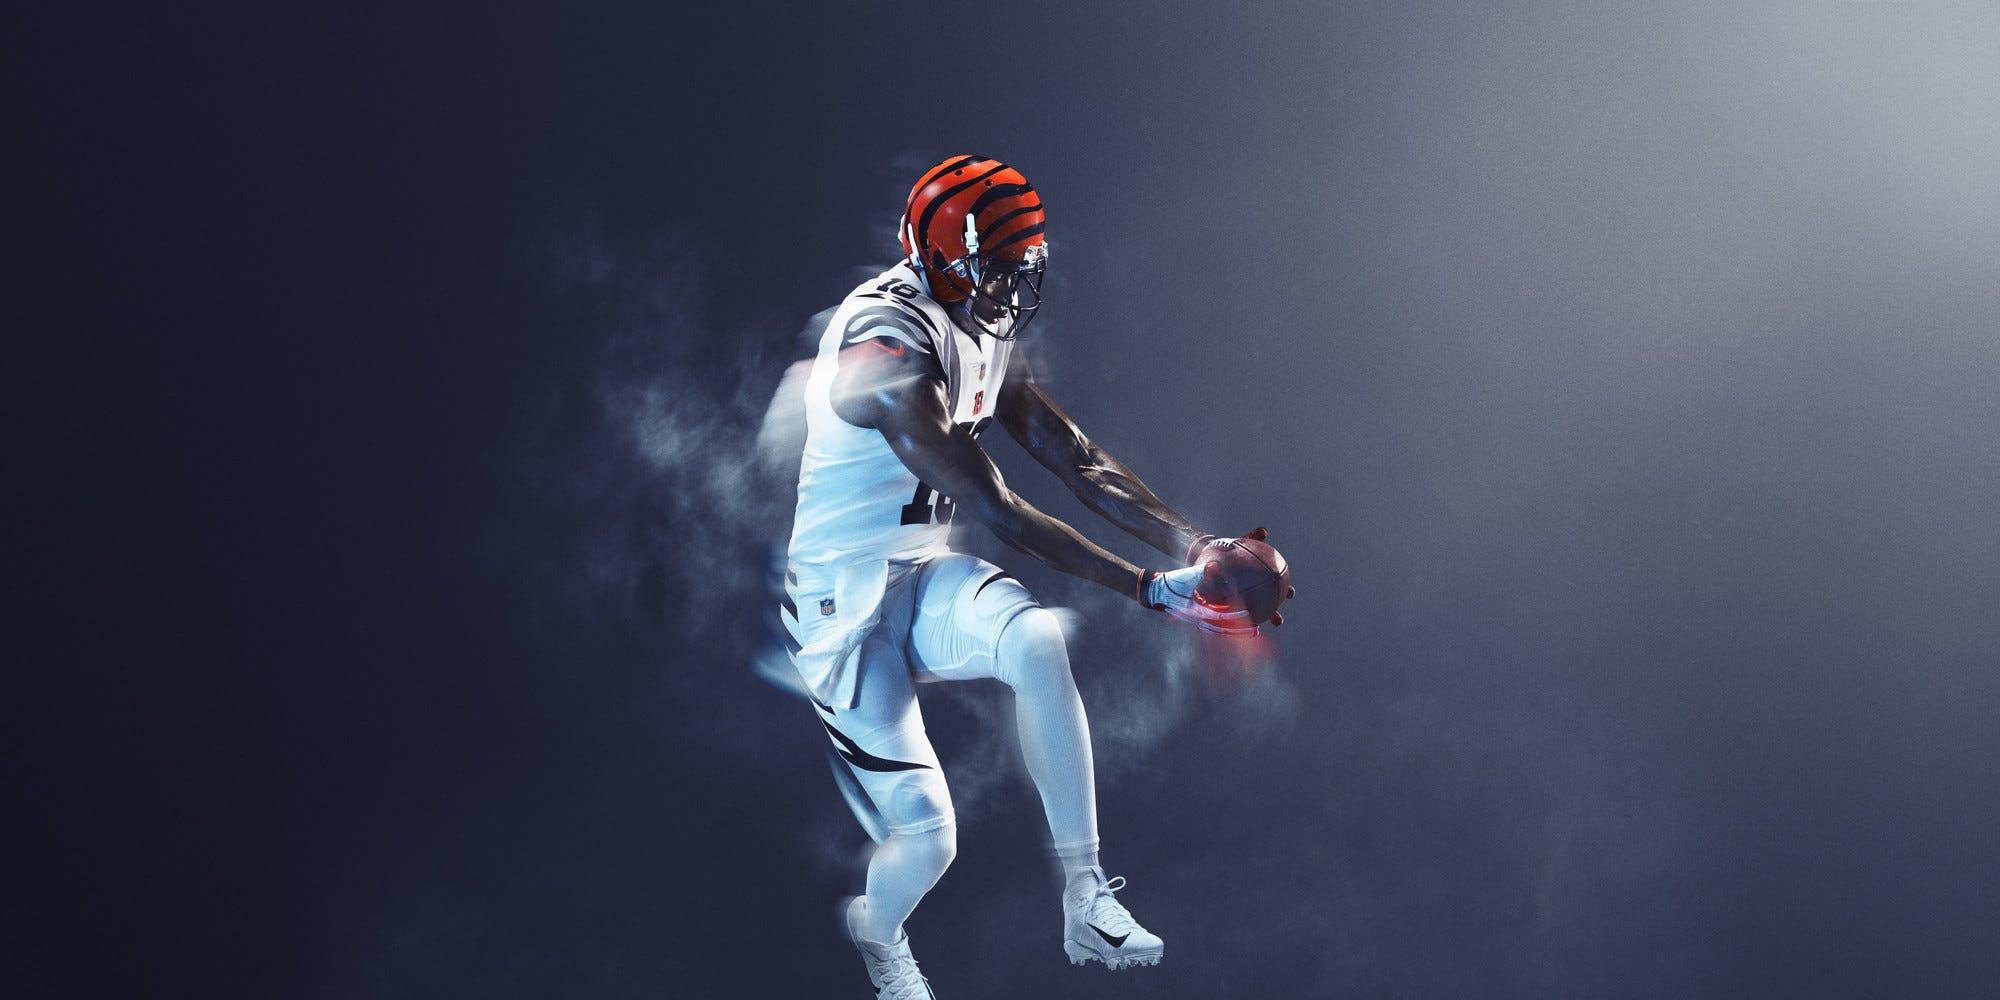 Nike's NFL Color Rush uniforms